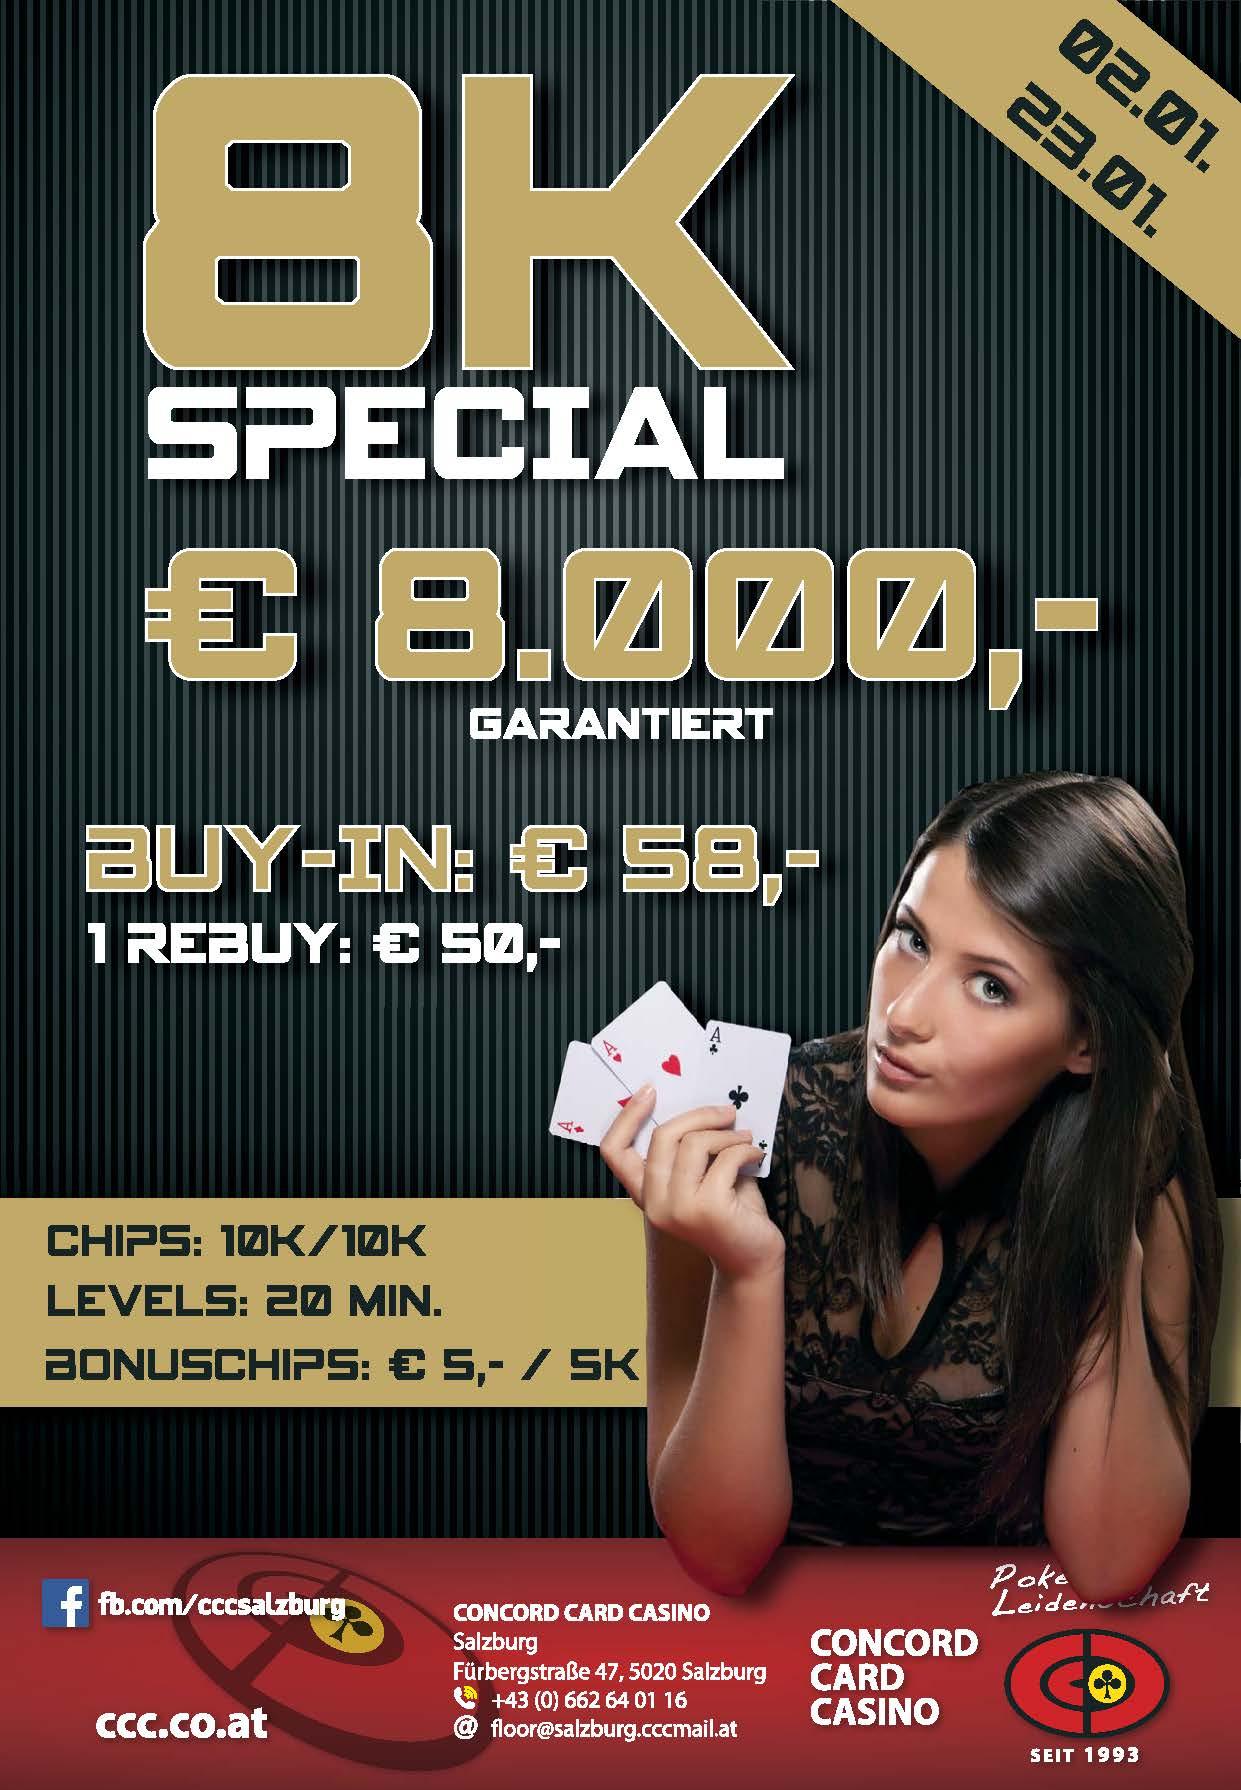 Ccc Casino Salzburg